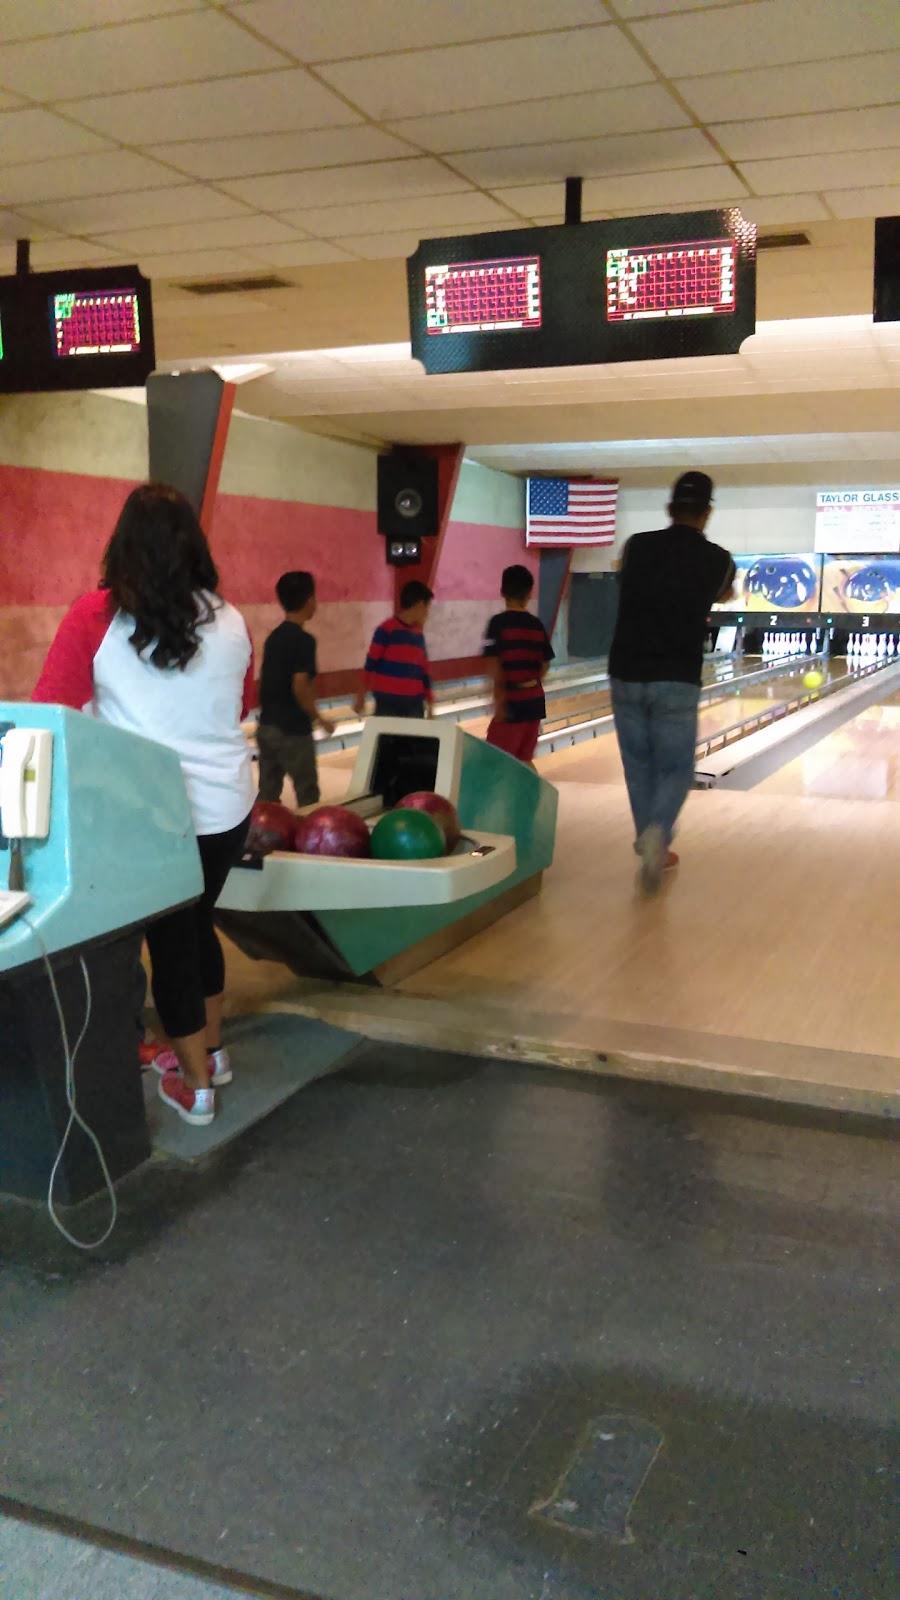 Pleasant Bowl - bowling alley  | Photo 3 of 10 | Address: 754 E 16th St, Mt Pleasant, TX 75455, USA | Phone: (903) 572-0347